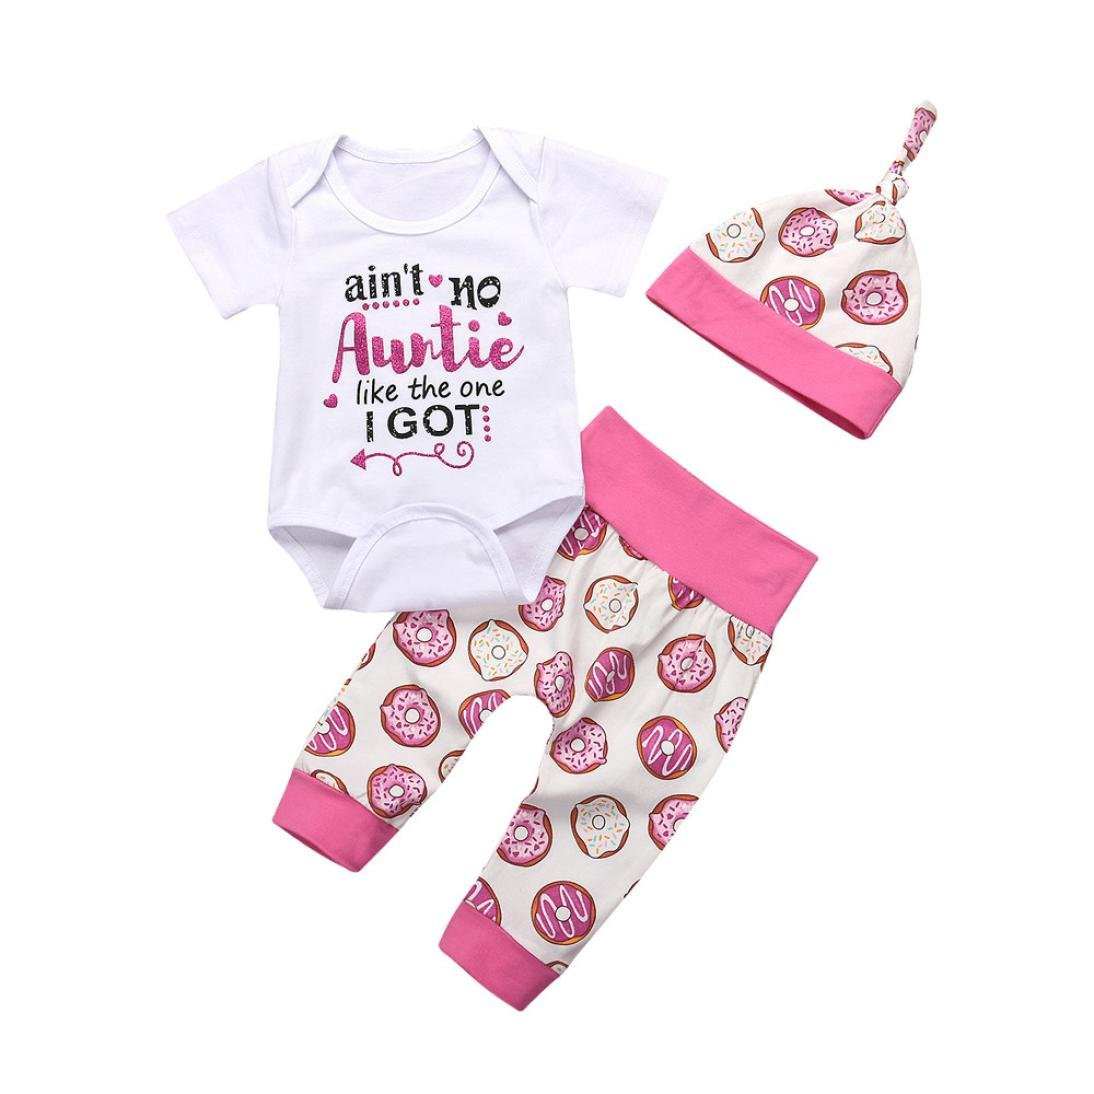 Hatoys 3PCS Toddler Baby Boys Girls Letter Print Romper Jumpsuit +Pants +Hat Outfits Set (6M(Height:65-70CM), White -E)